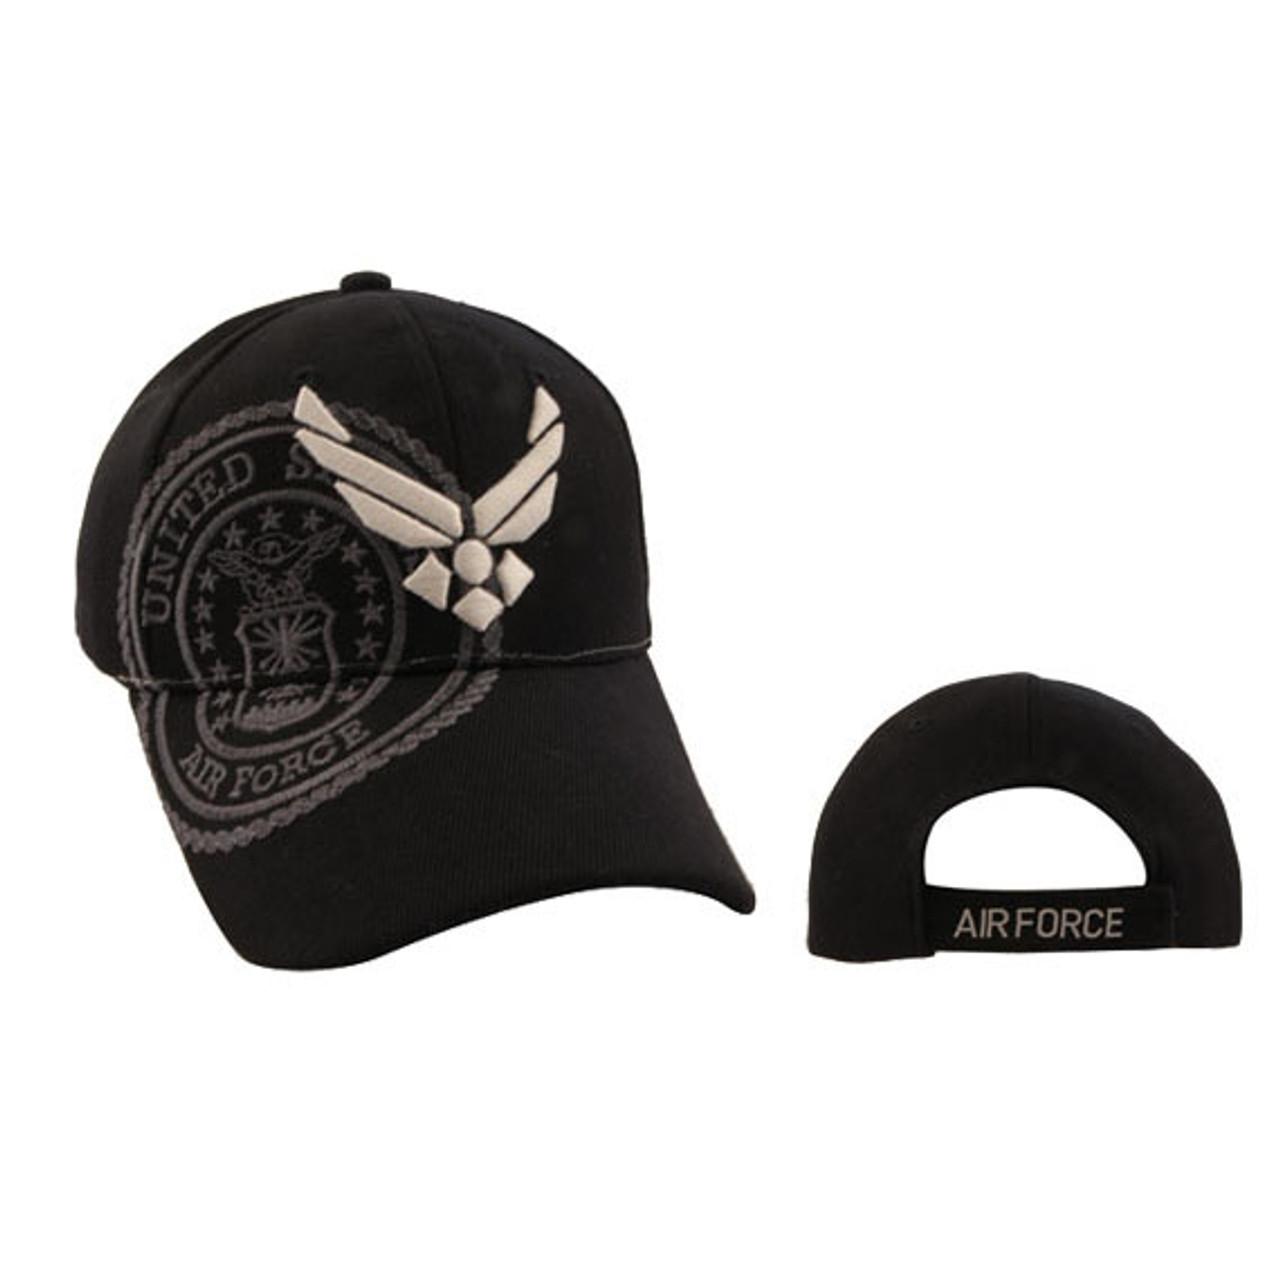 U.S. Air Force Baseball Hat Wholesale-Black